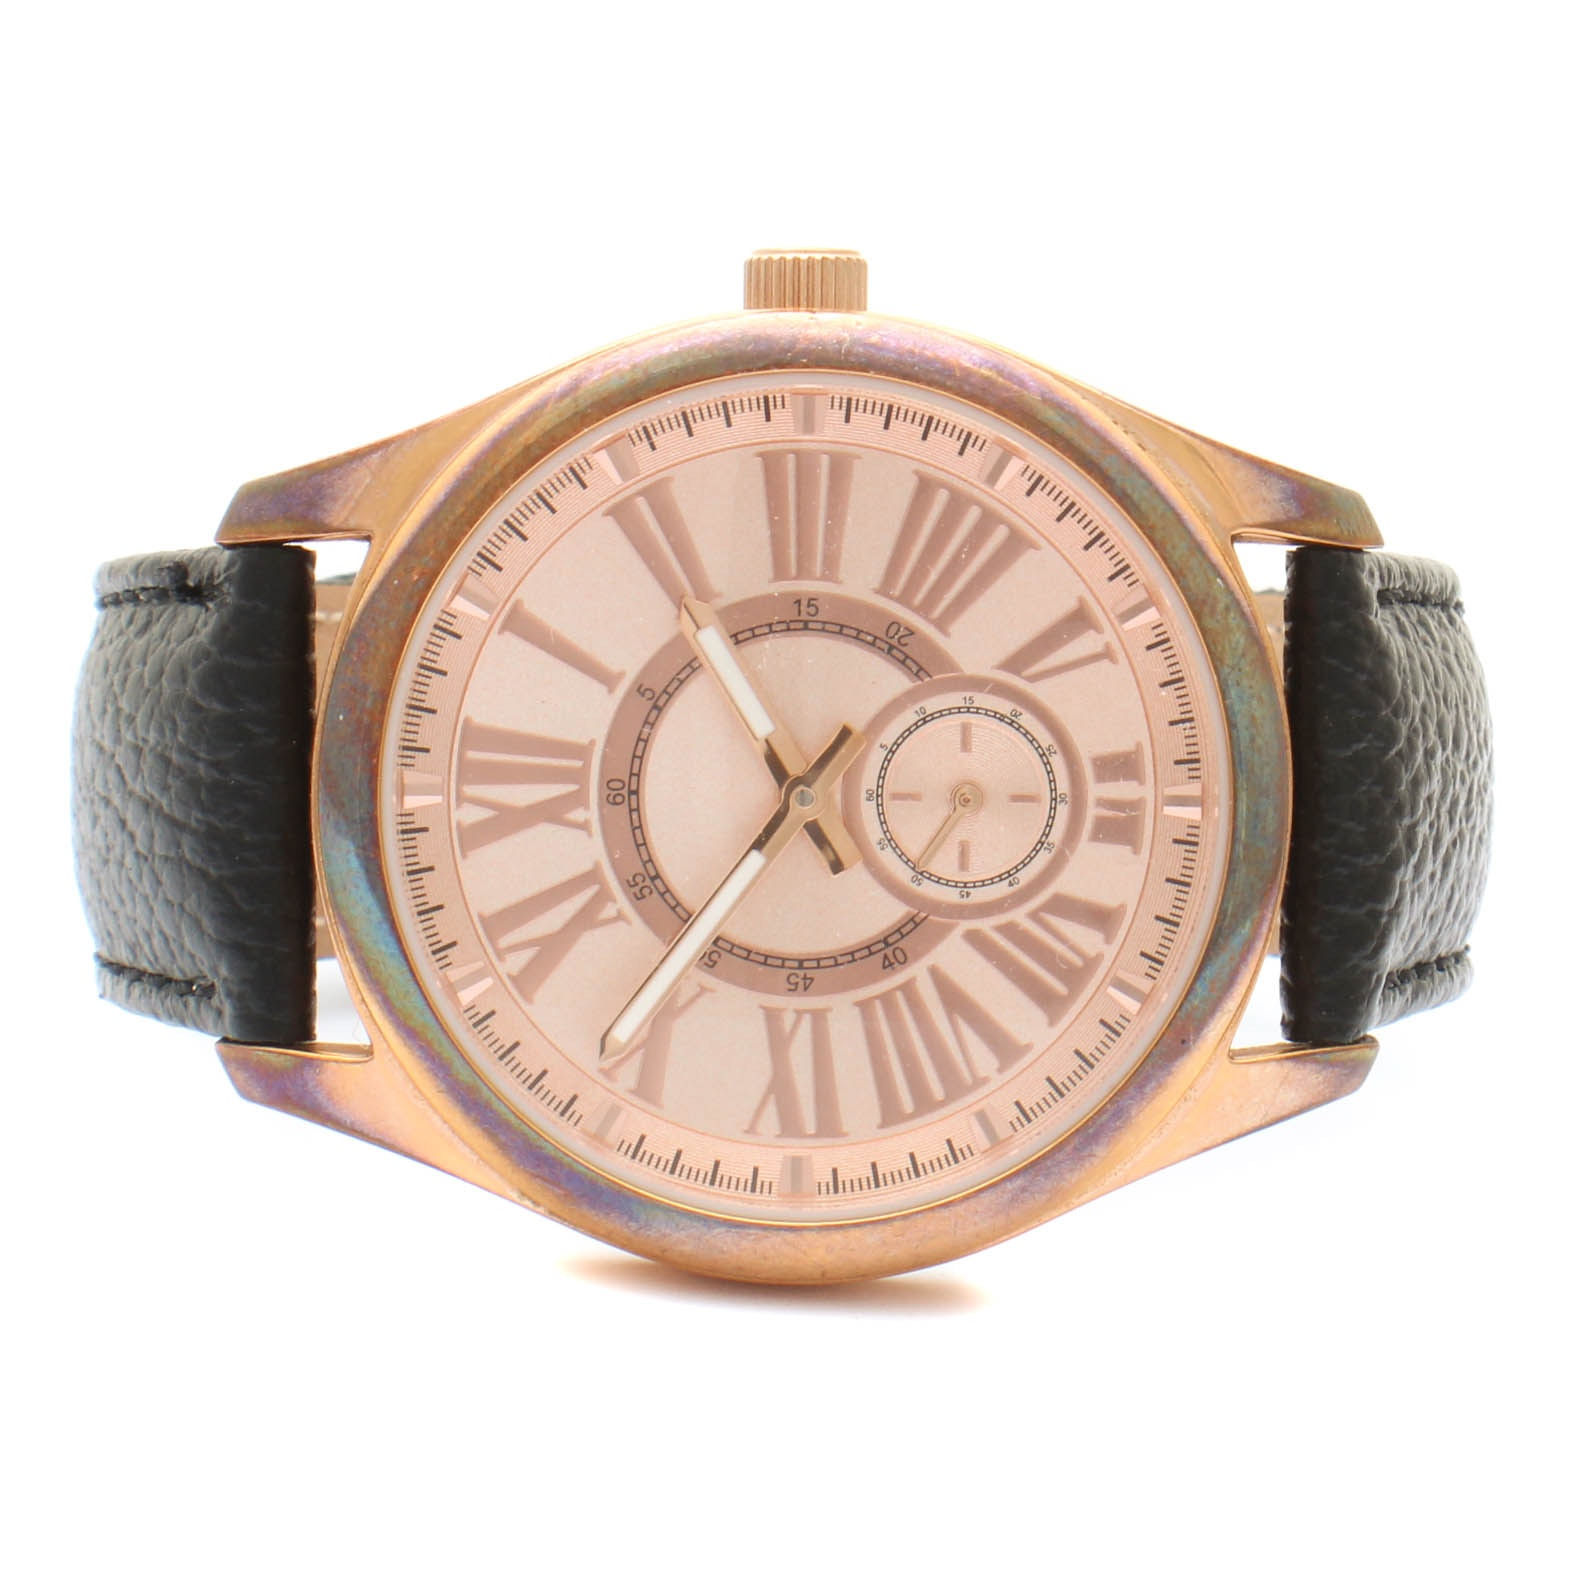 Bronzo Italia Wristwatch with Black Leather Band